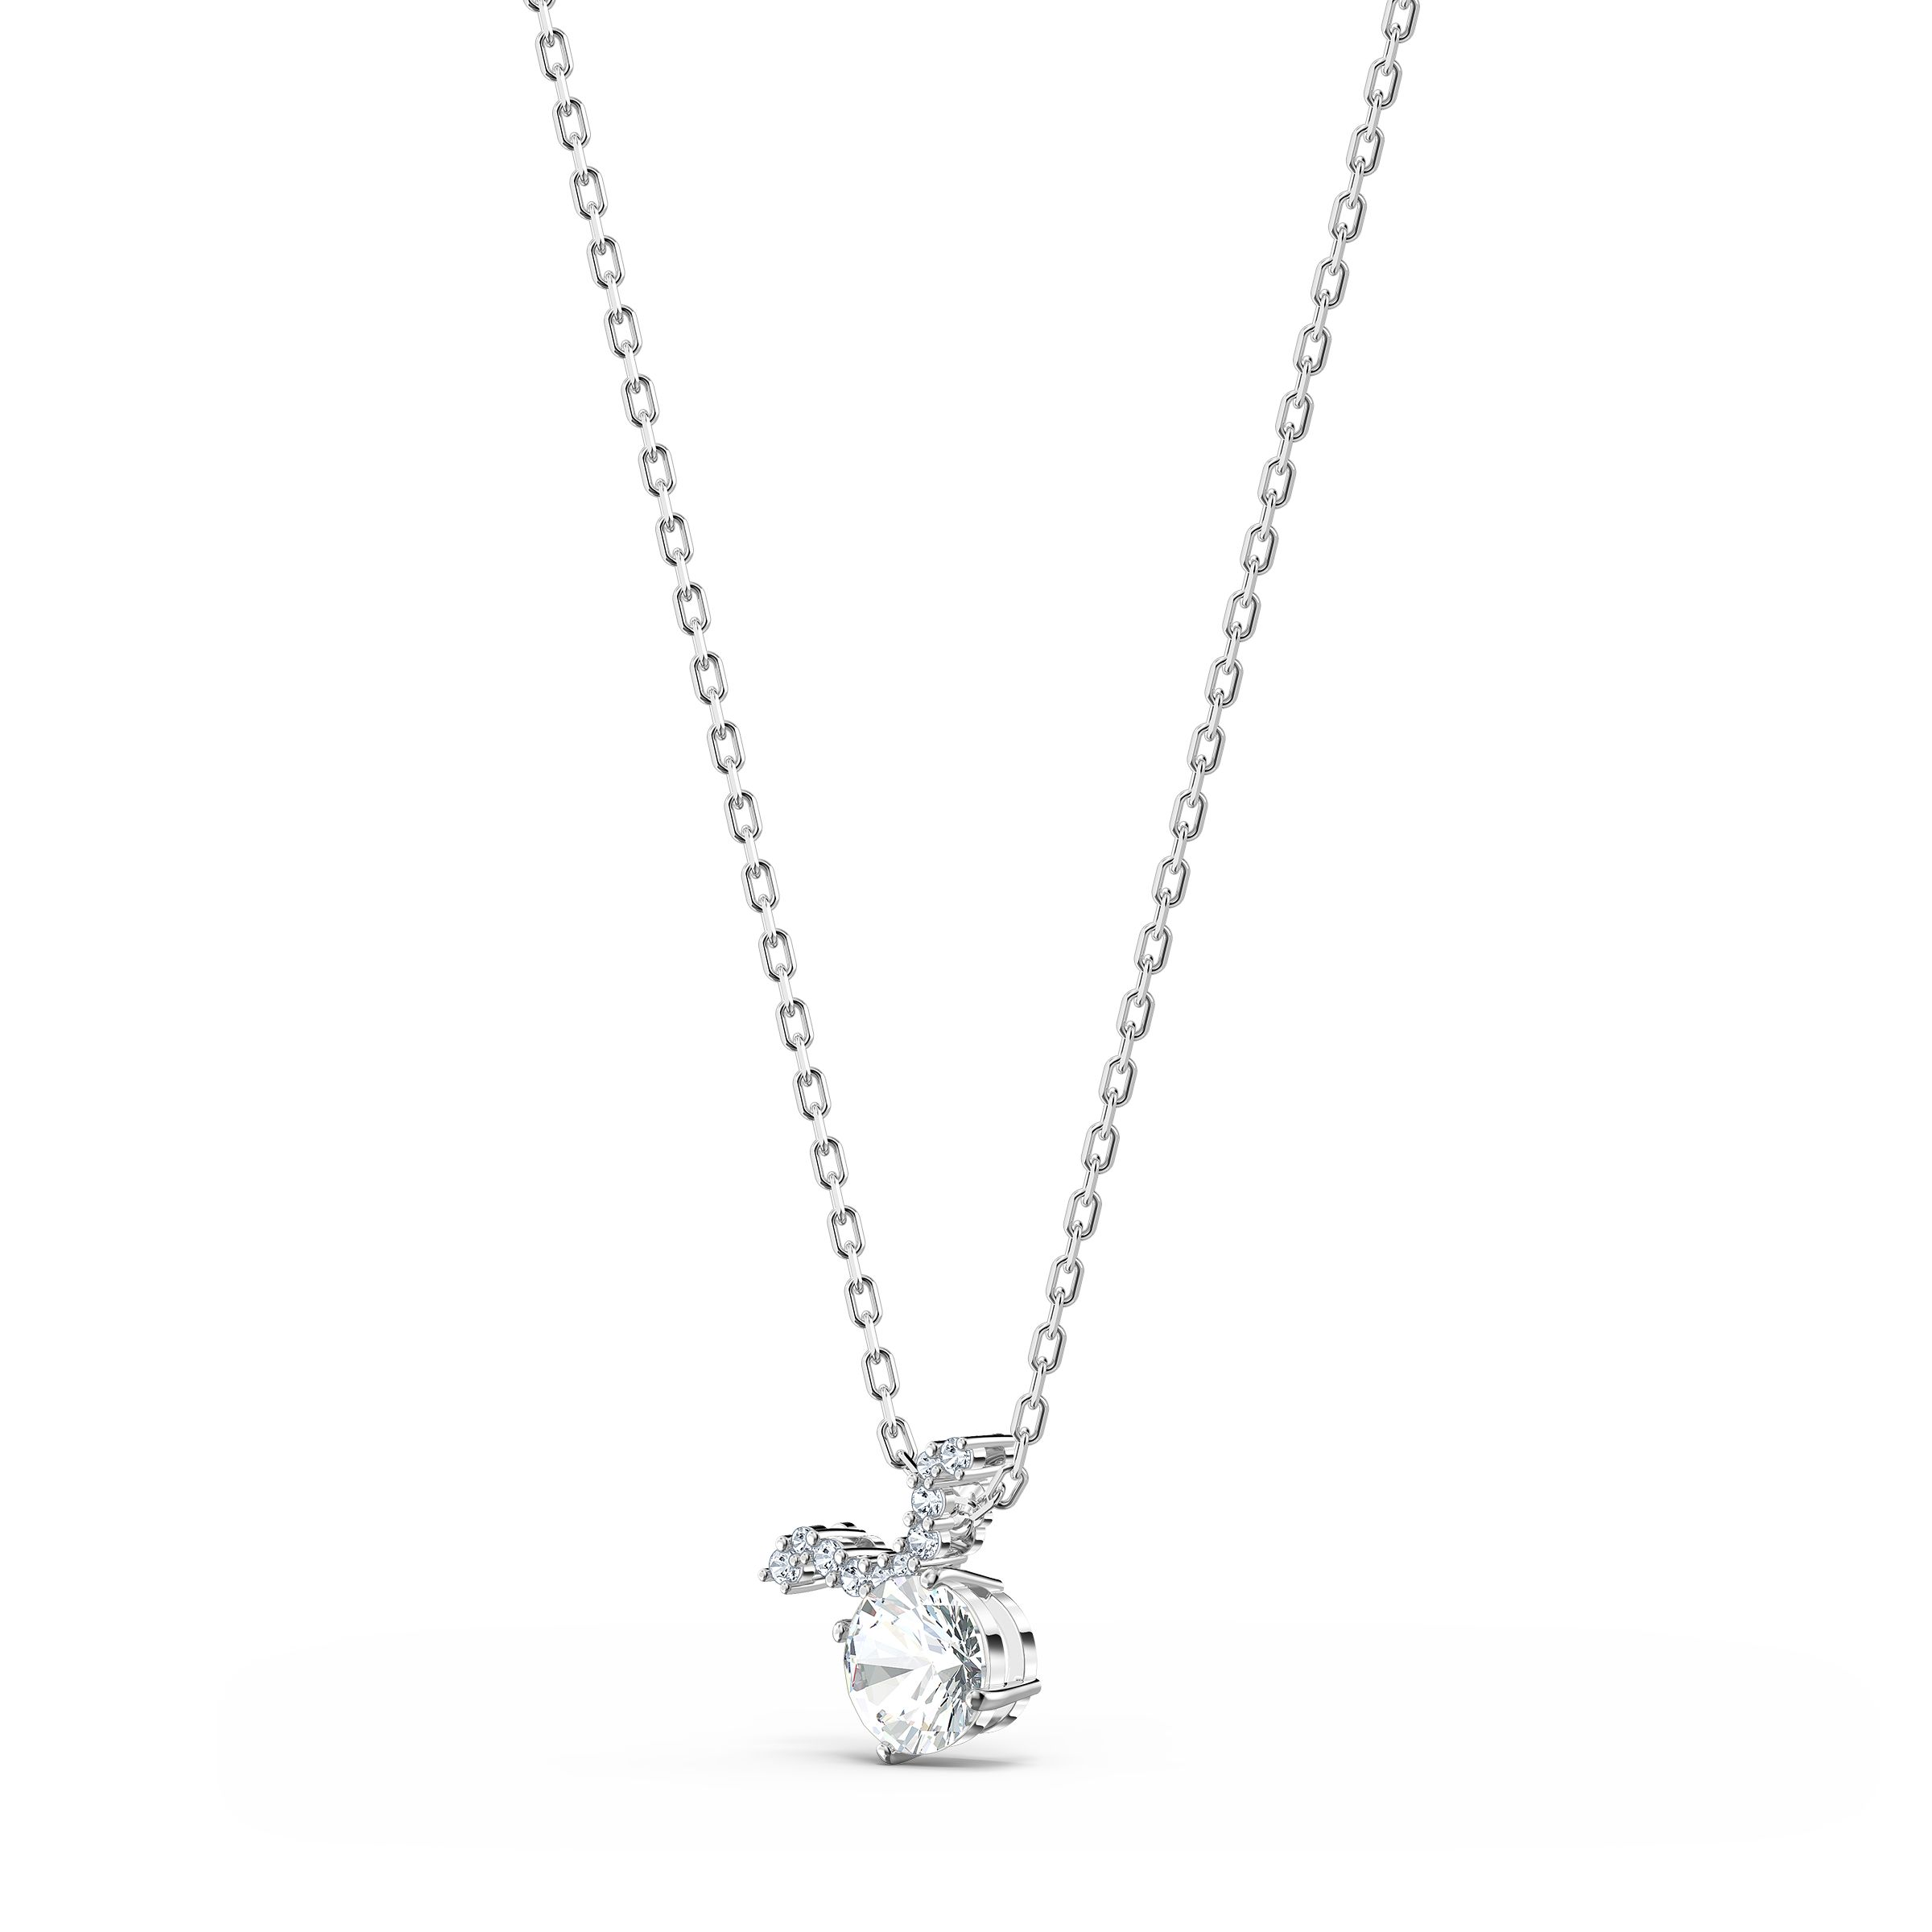 Pendentif Zodiac II, Taureau, blanc, finition mix de métal, Swarovski